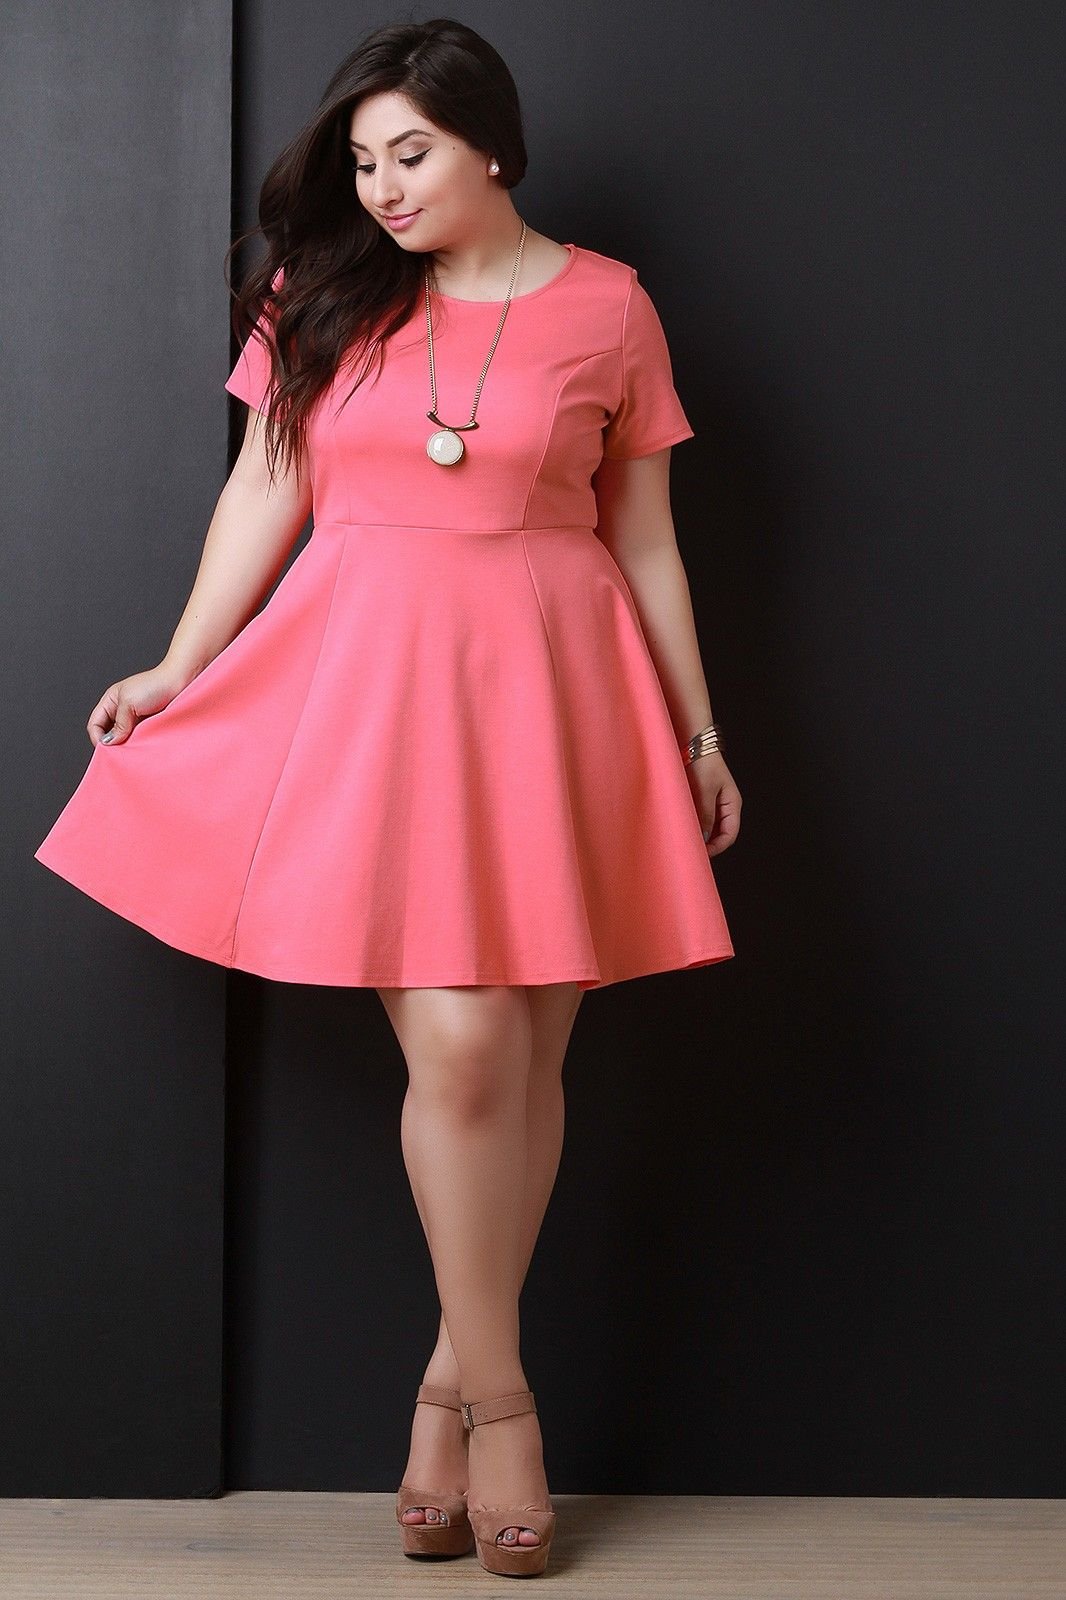 476e2cbf30e Coral Round Neck Short Sleeves Skater Dress - This plus size skater dress  features a round neckline